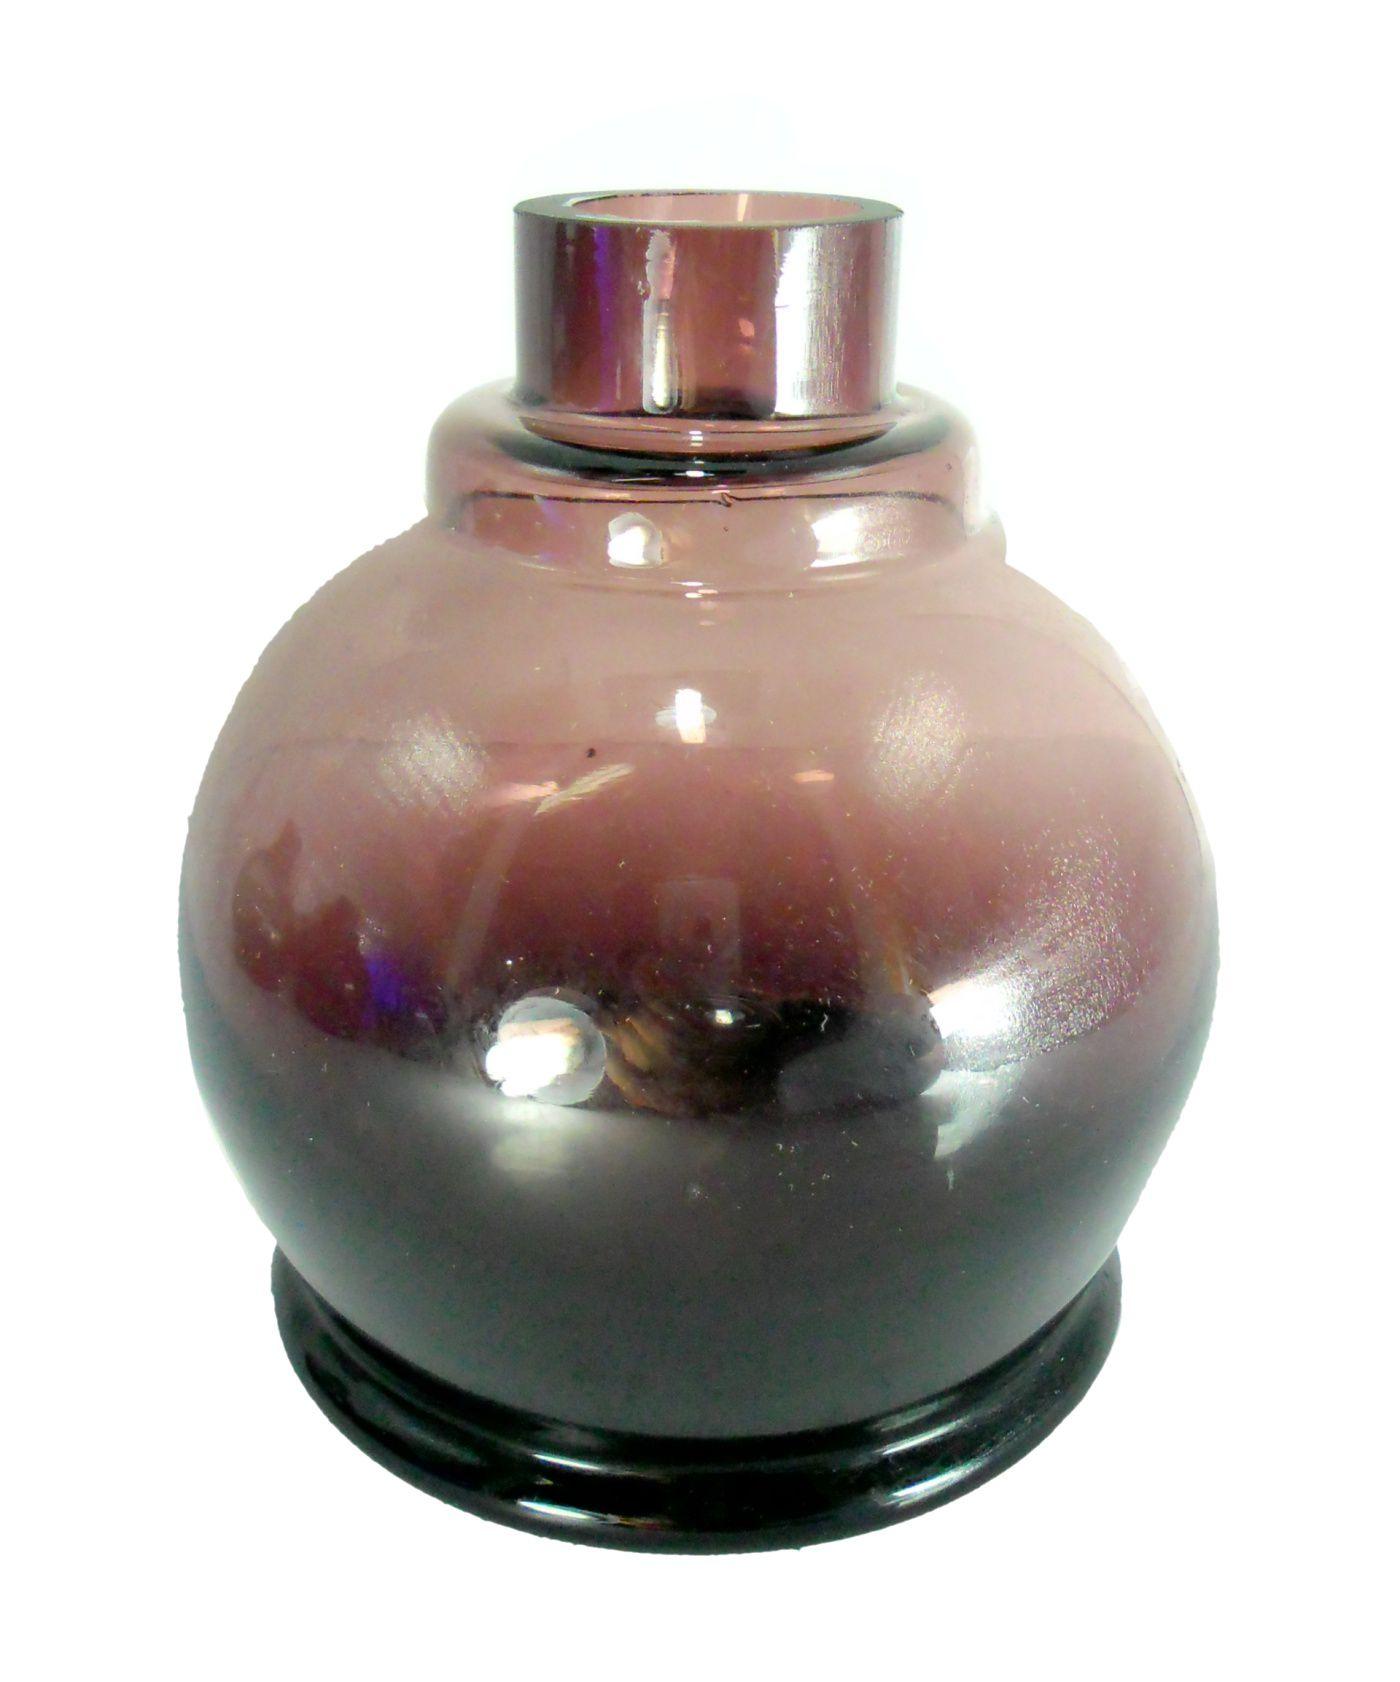 Vaso/base para narguile Luna Ball. 13cm altura e 3,8cm diâmetro de bocal. Encaixe macho (interno). Lilás